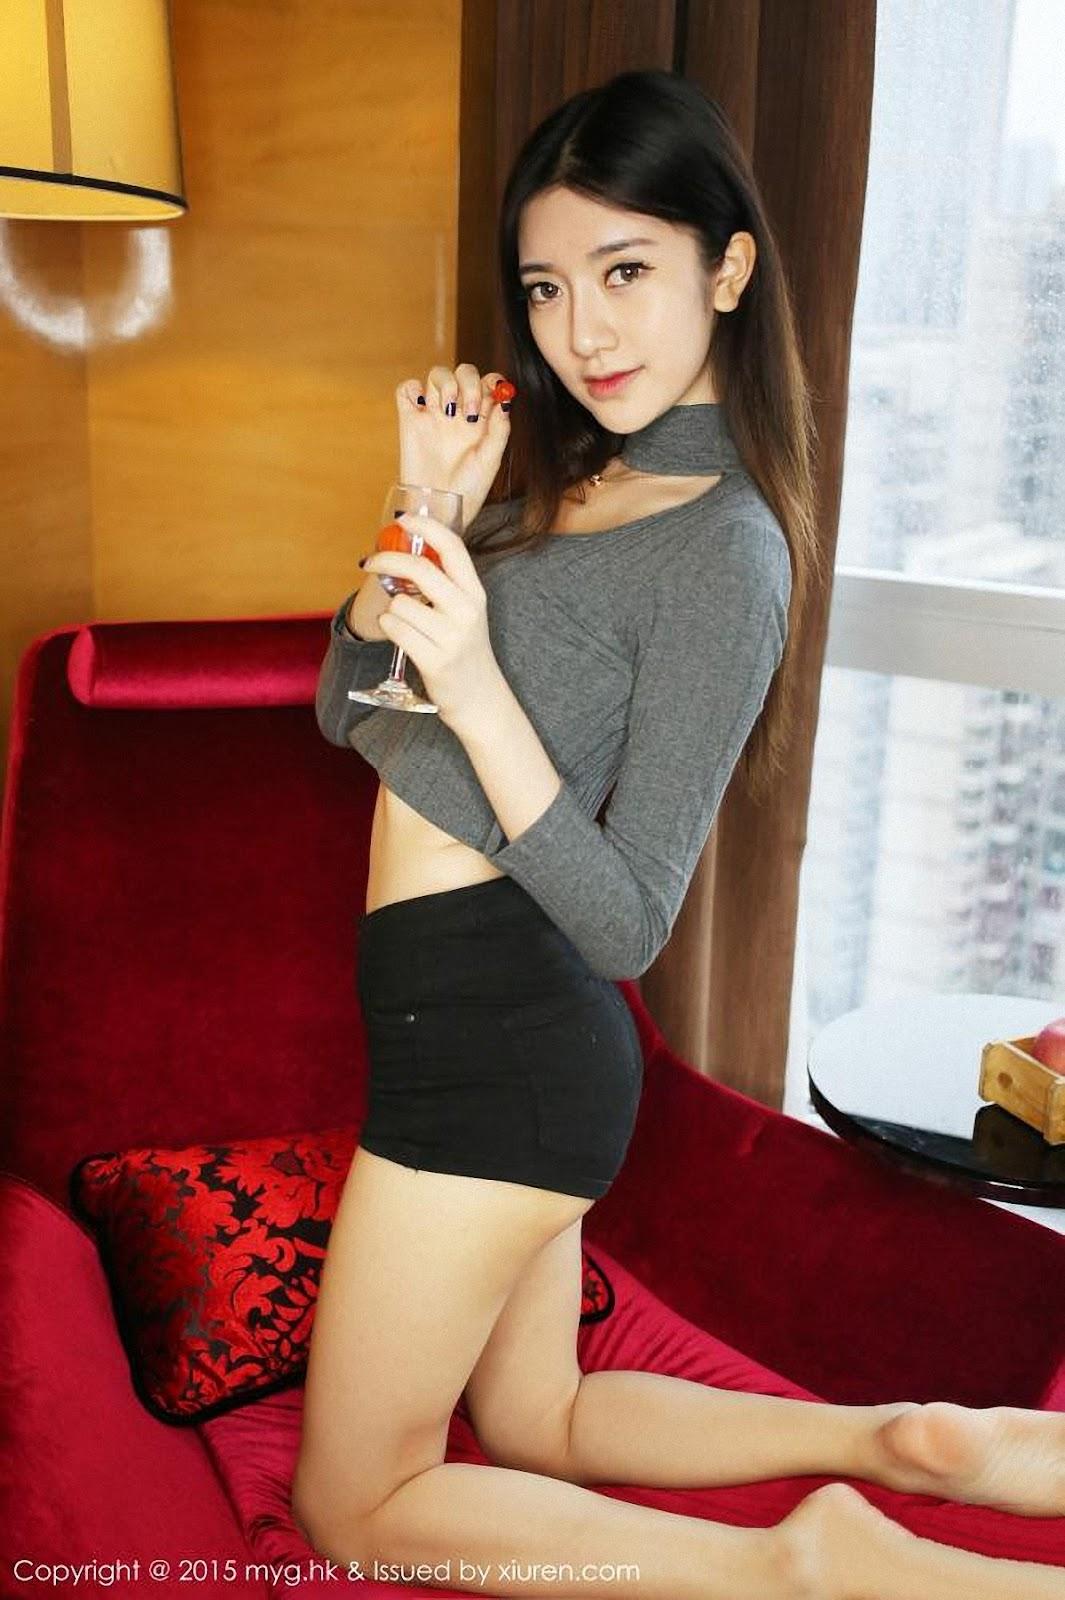 34 - Sexy Girl Model MYGIRL VOL.119